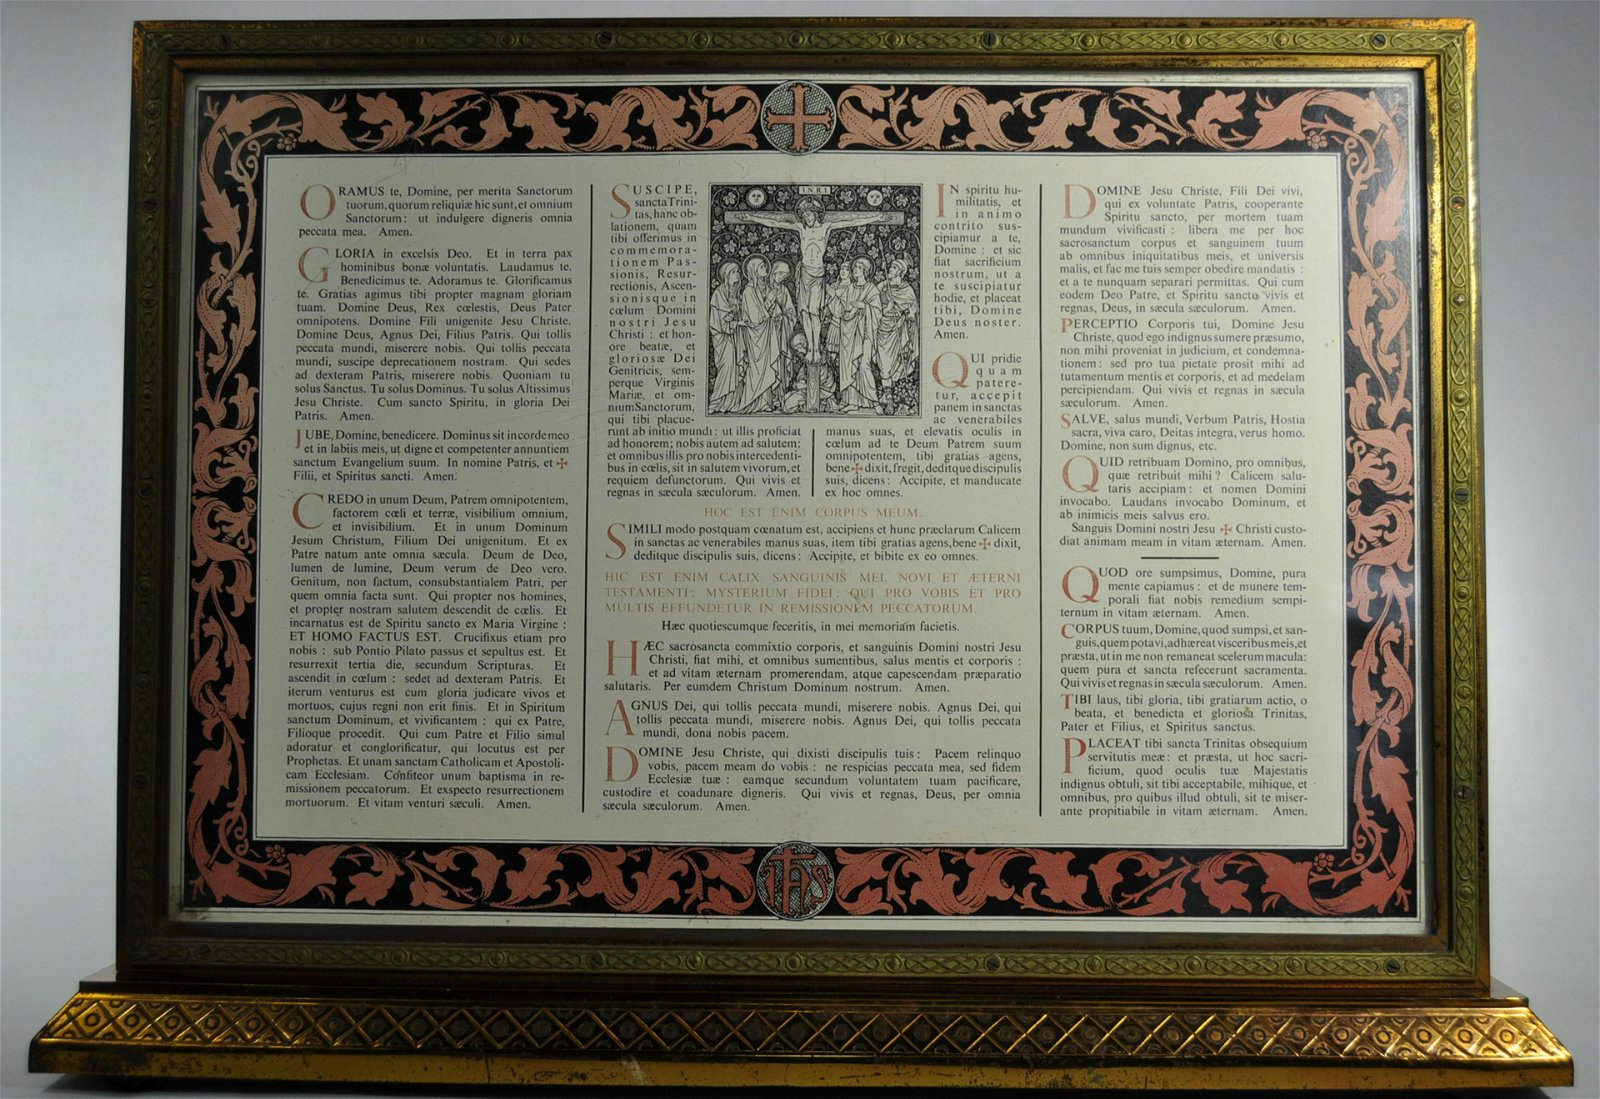 Gunning & Son Ltd. Framed Tridentine Altar Card